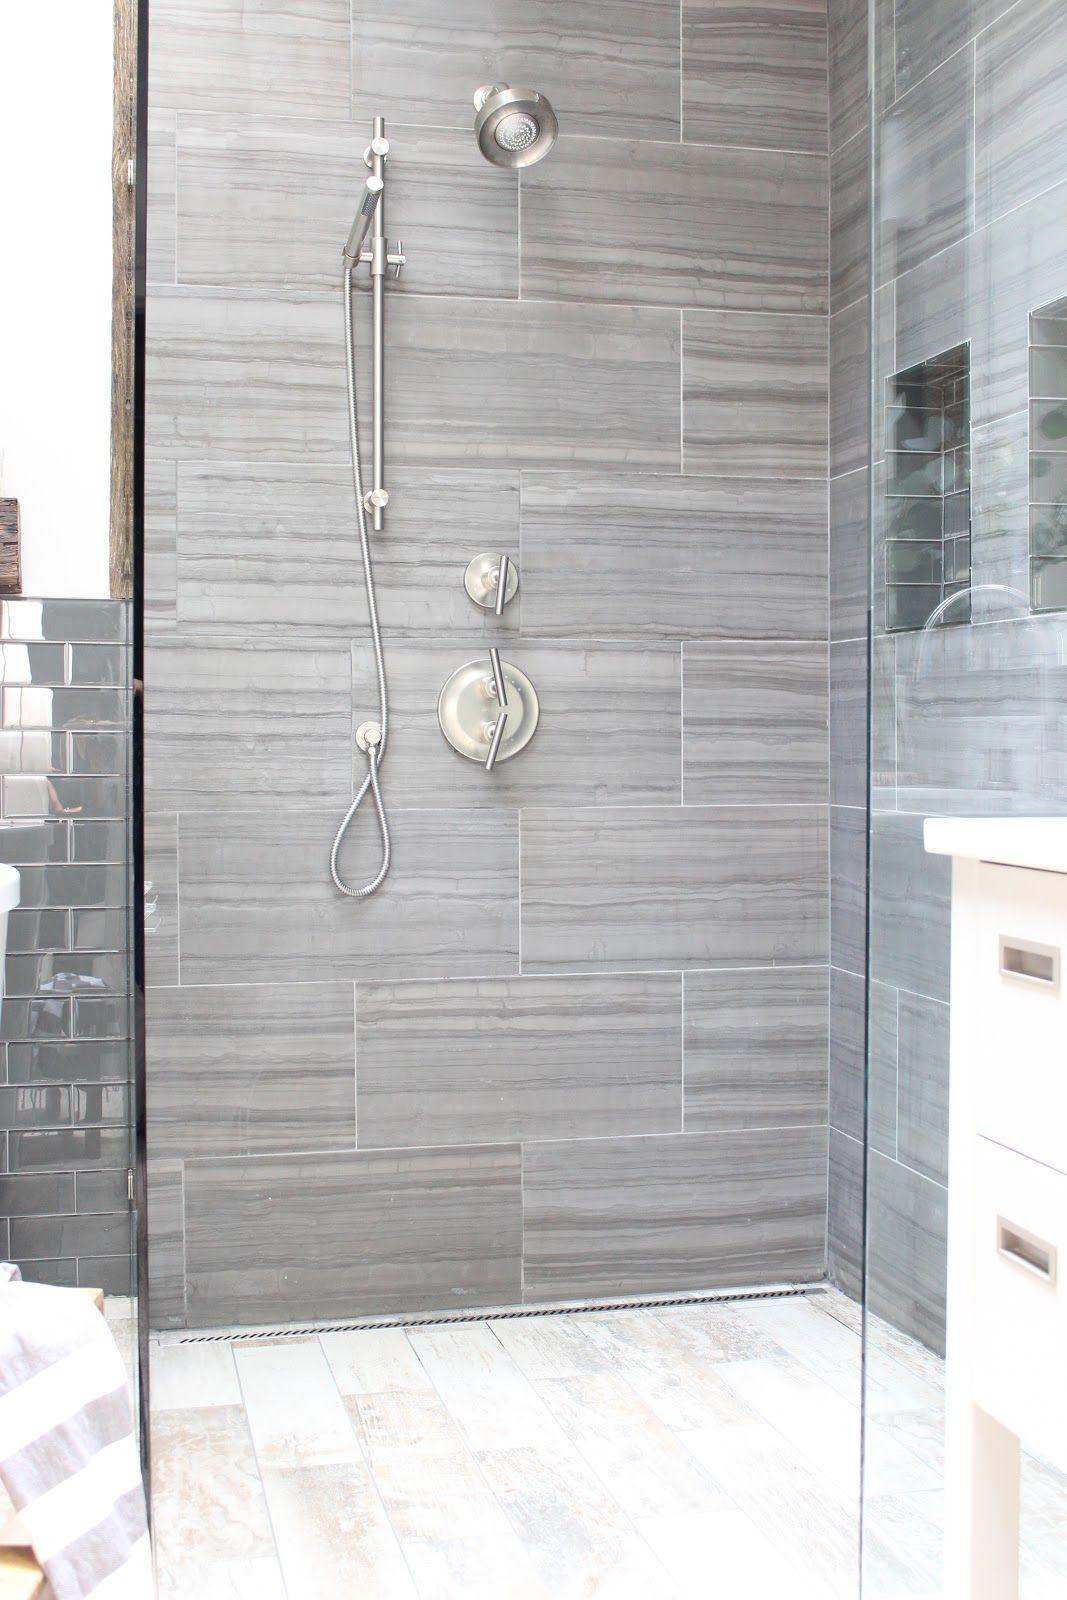 design indulgence: BEFORE AND AFTER - shower tile here: www.flooranddecor... floor tile here: www.flooranddecor...